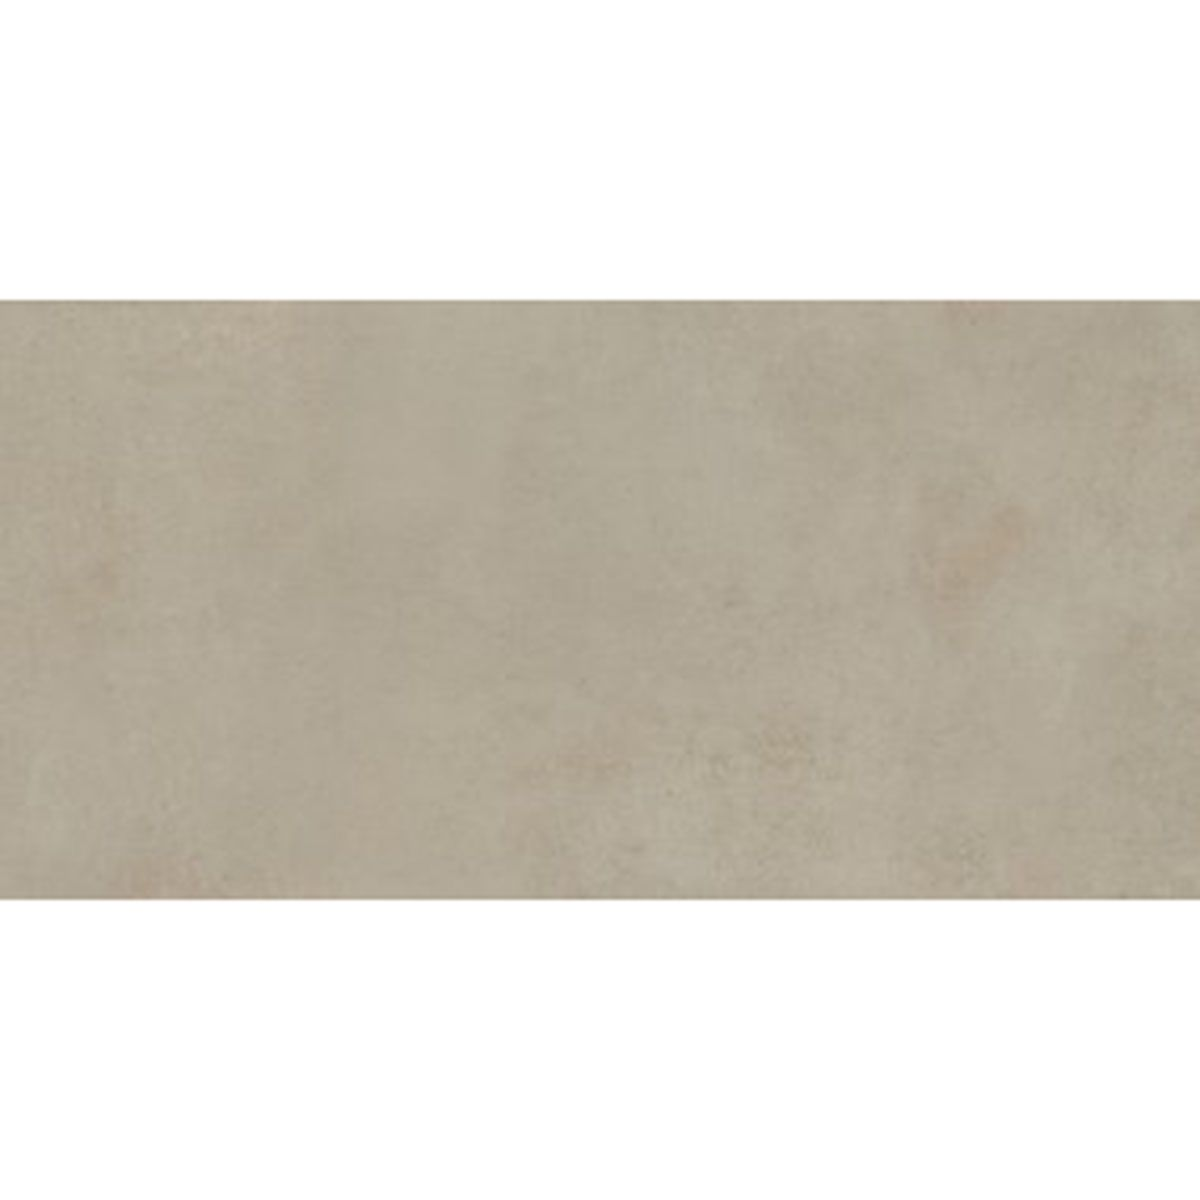 RAK Surface Light Sand Lappato Tile 600 x 1200mm